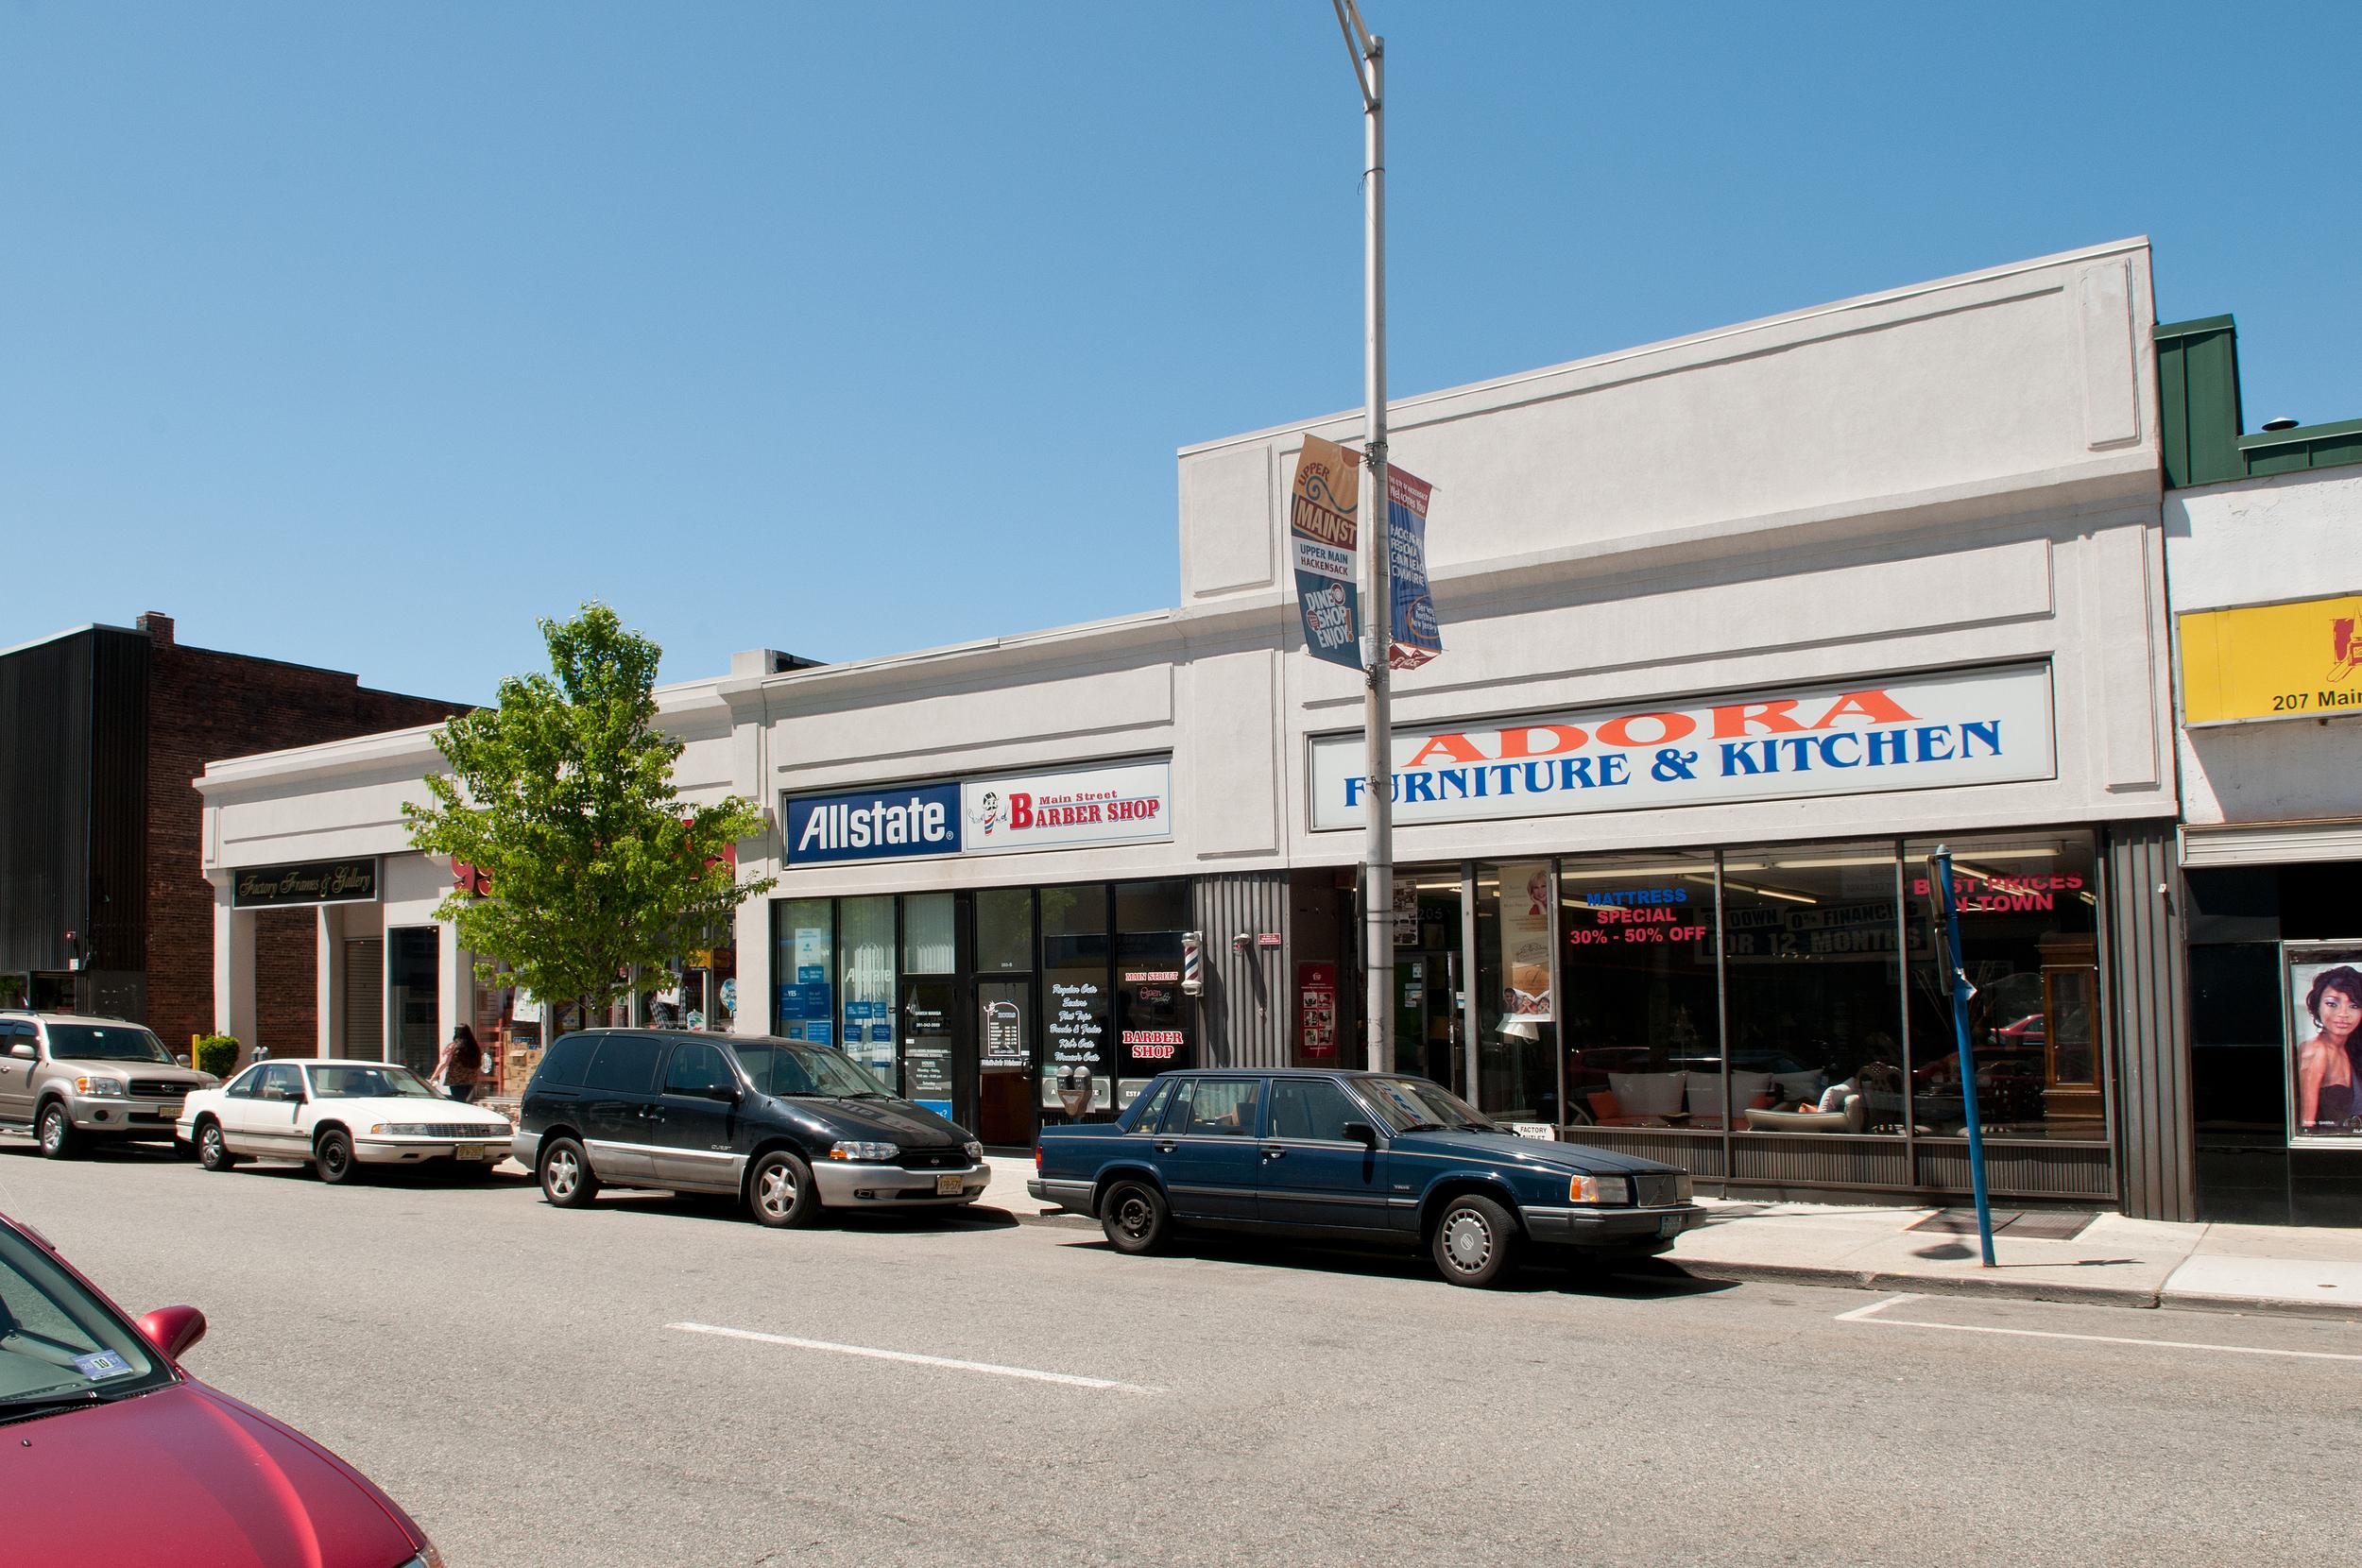 199-205 Main Street, Hackensack